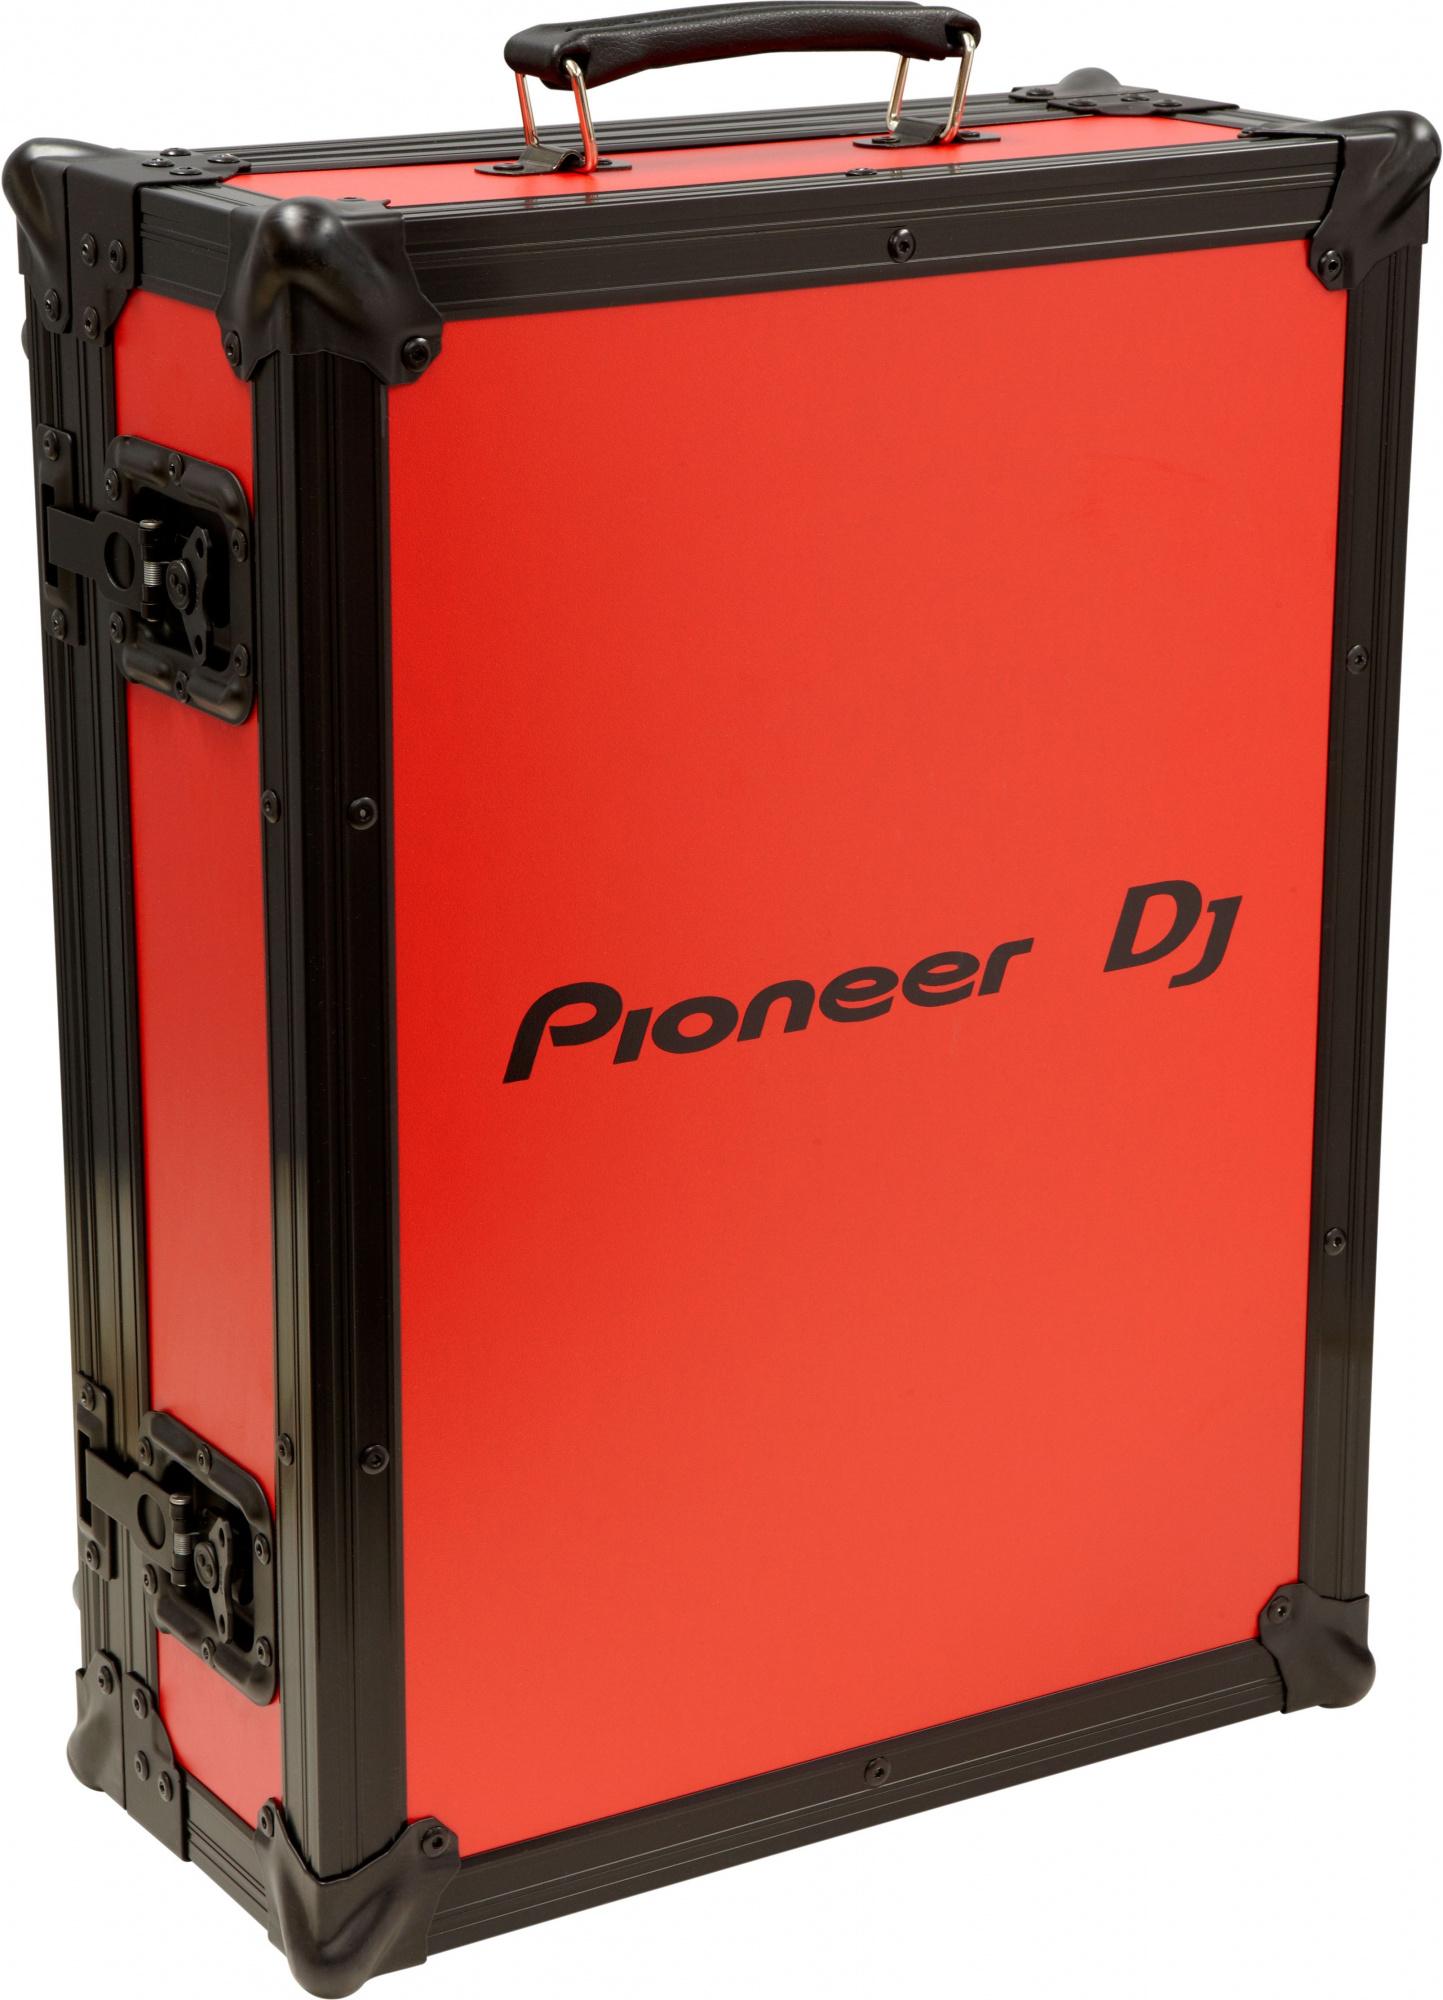 Pioneer PRO-2000FLT - кейс для контроллера CDJ-2000 (Red) от iCover